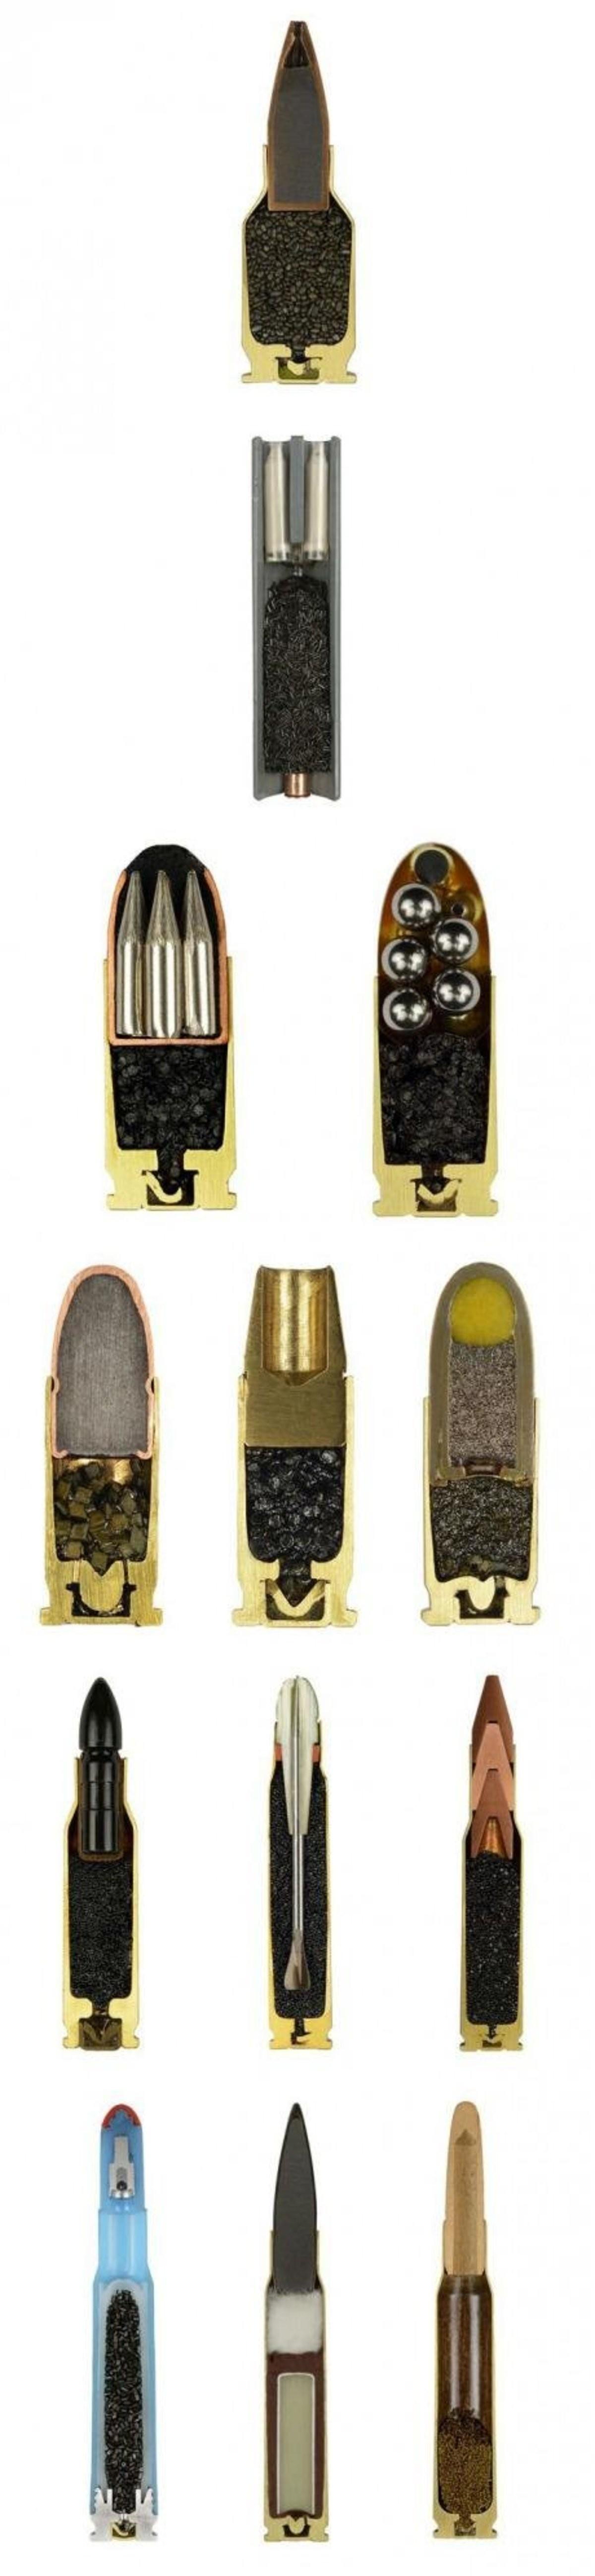 "lewd. .. 1. .224 Boz aka a 9x19mm necked down to accept 5.56x45mm projectile 2. Unknown 3. 9x19mm Cobra ""High Safety Ammunition"" - steel darts inside a polymer lewd 1 224 Boz aka a 9x19mm necked down to accept 5 56x45mm projectile 2 Unknown 3 Cobra ""High Safety Ammunition"" - steel darts inside polymer"